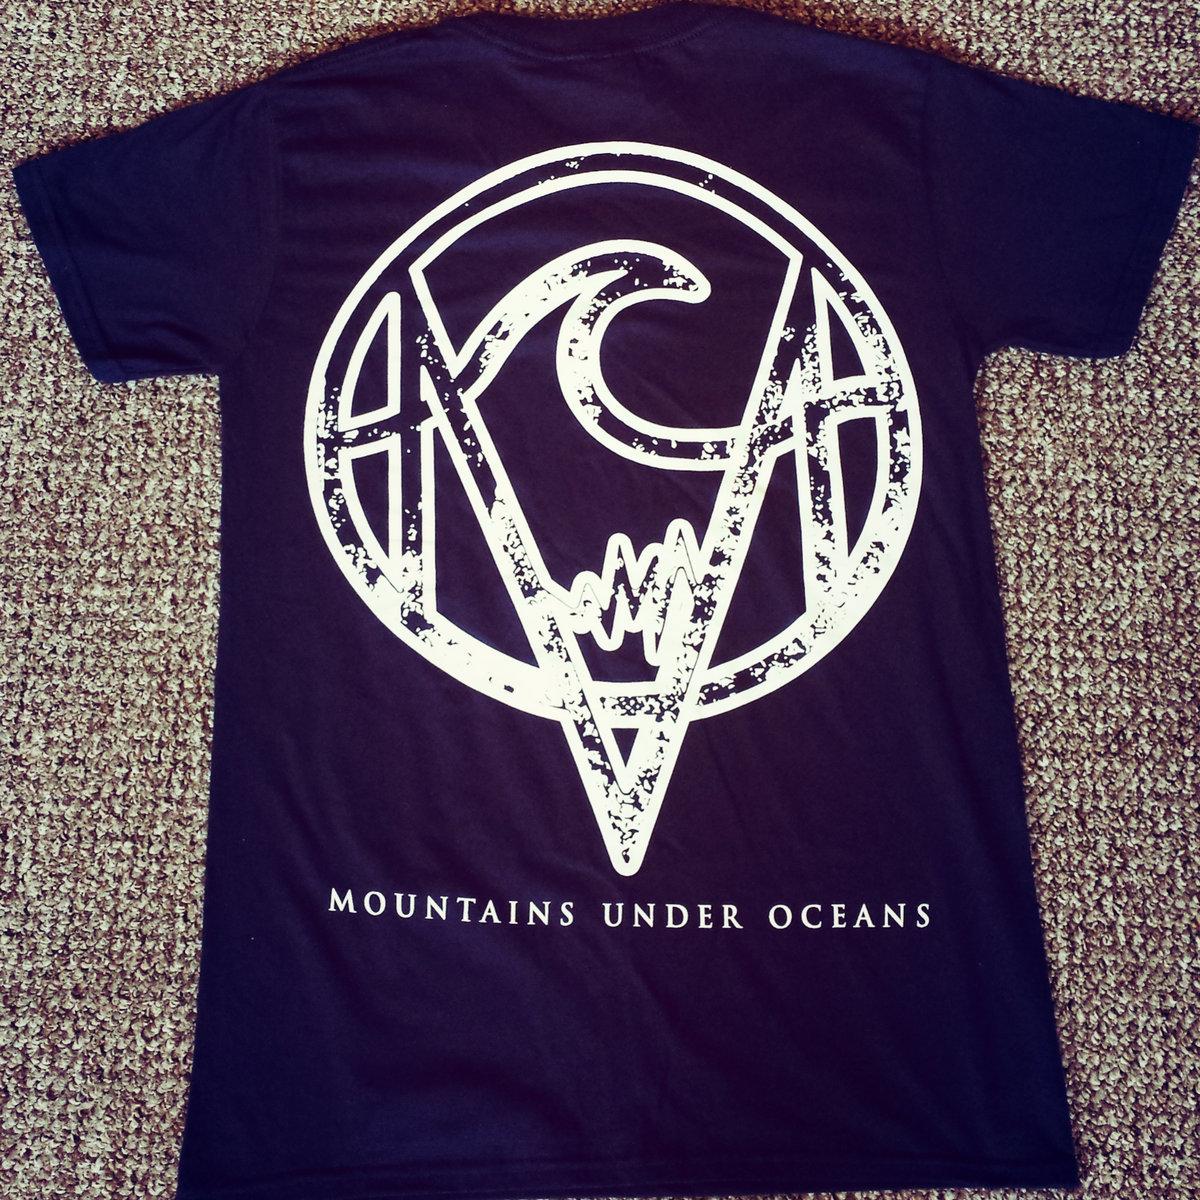 Design t shirt back - Navy Mountains Under Oceans T Shirt White Ink Pocket And Full Back Design